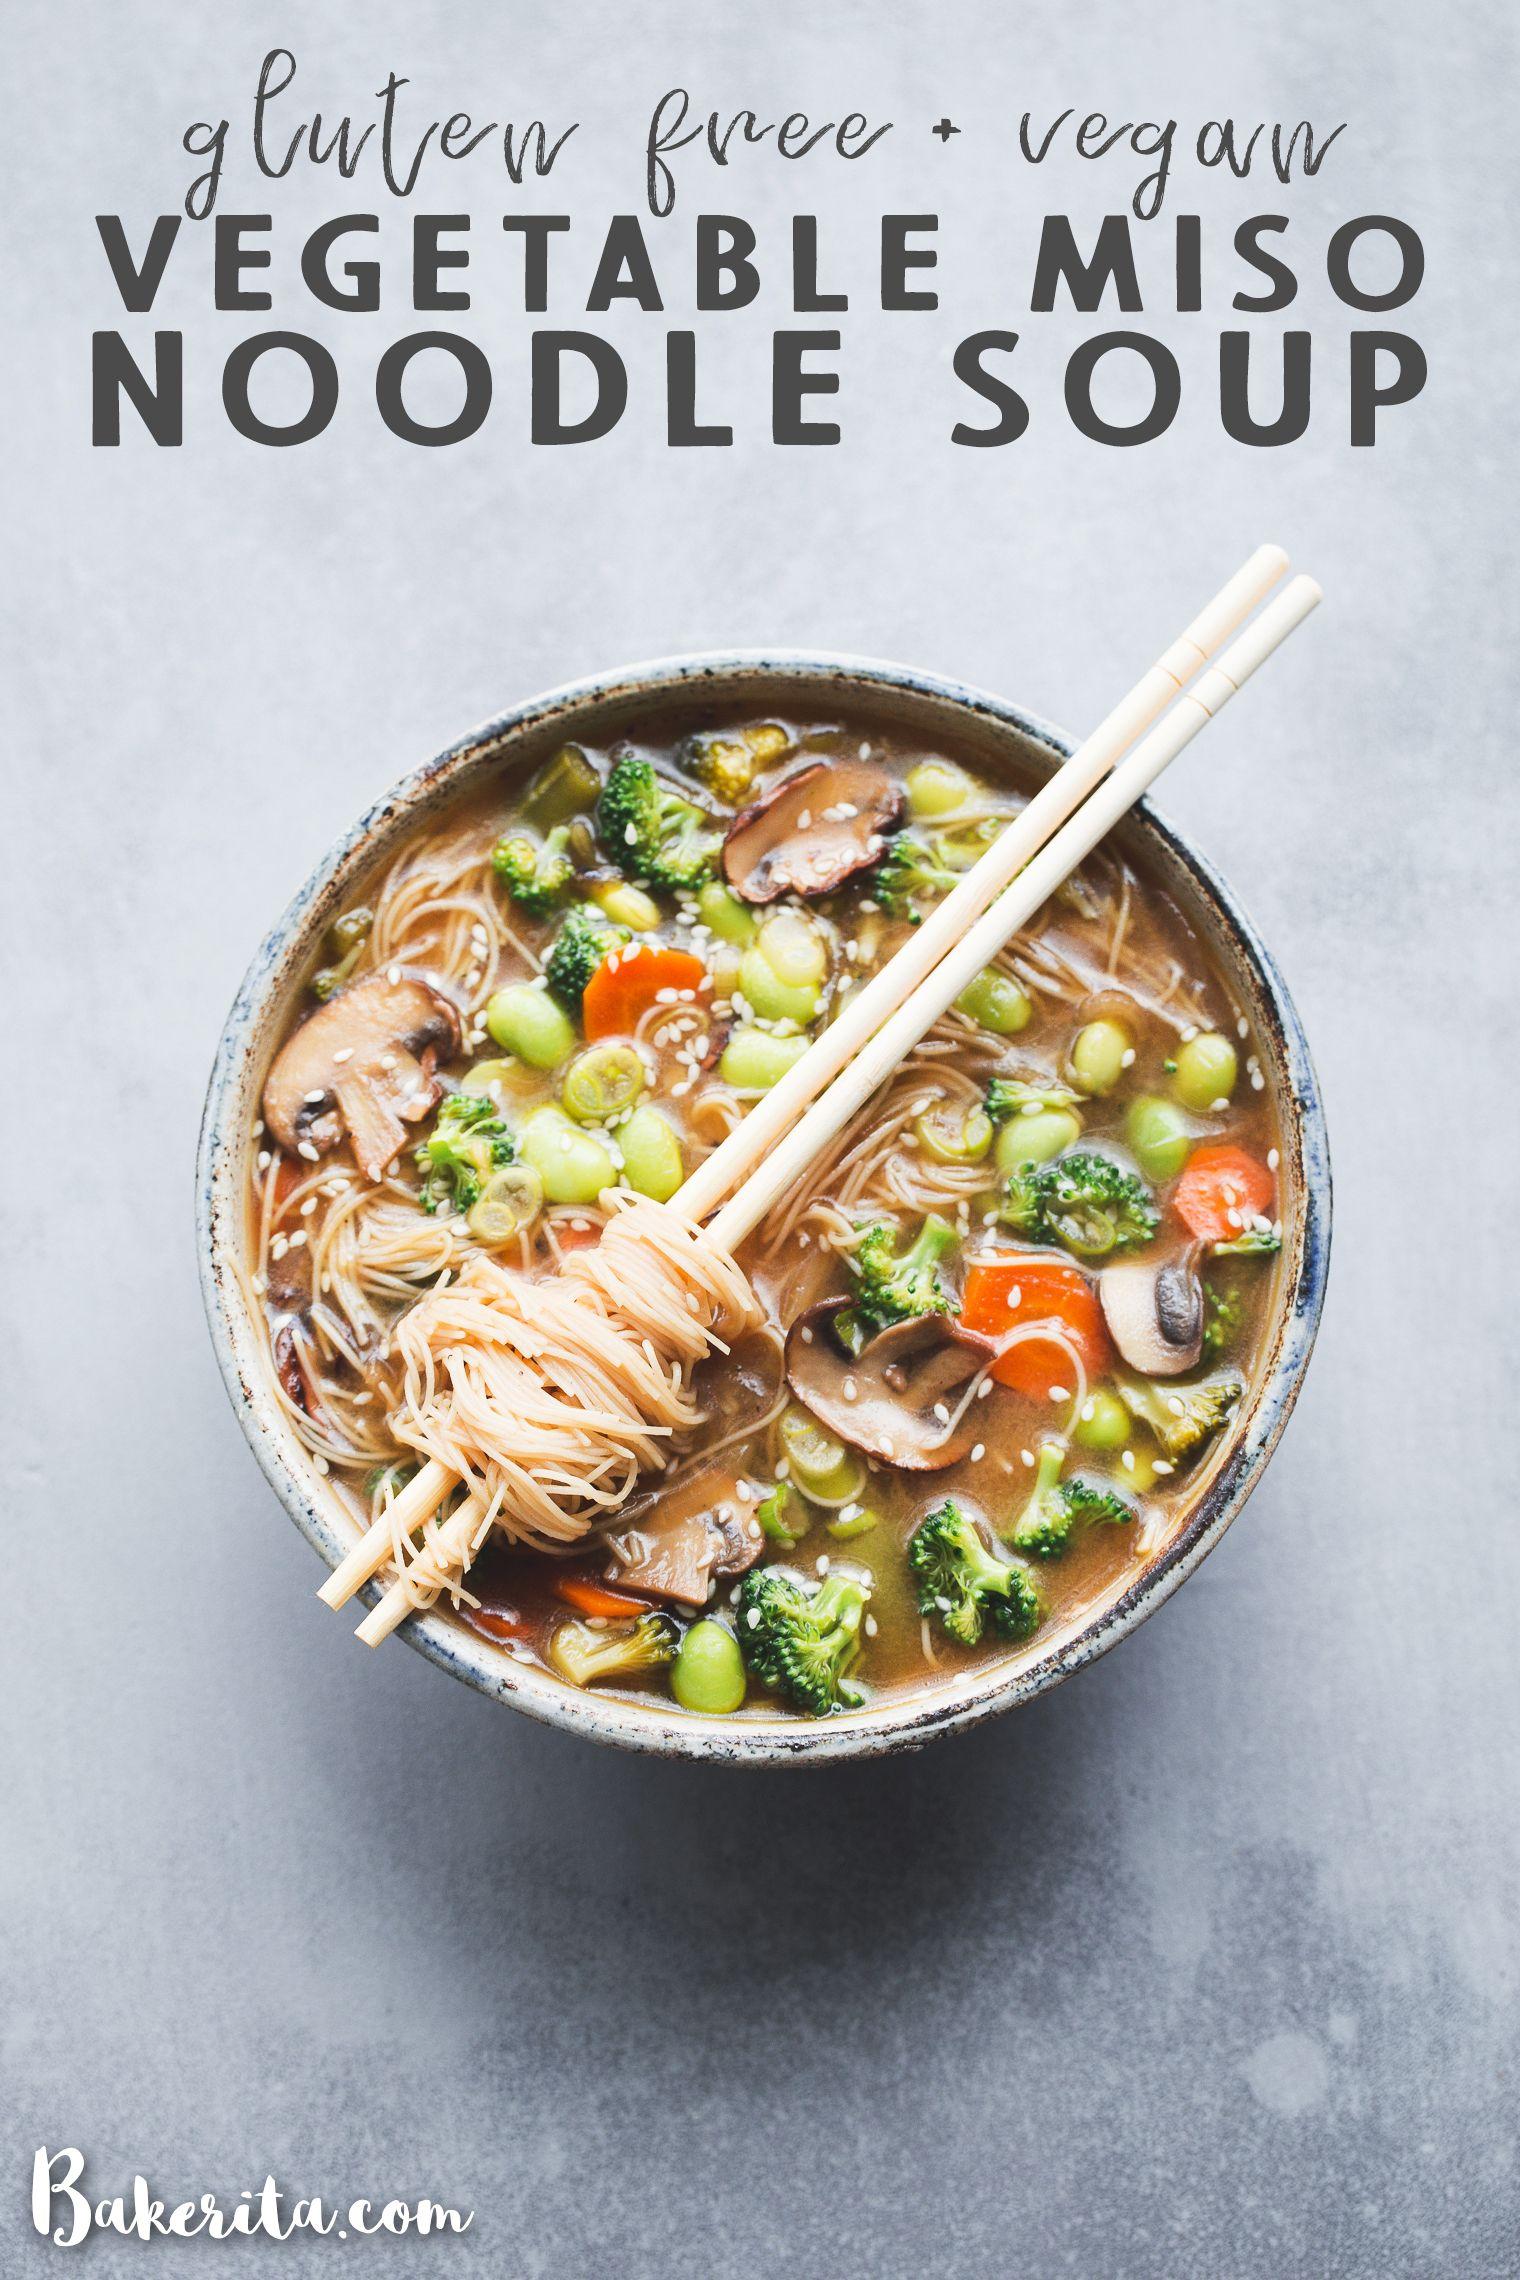 Gluten Free Vegan Vegetable Noodle Miso Soup